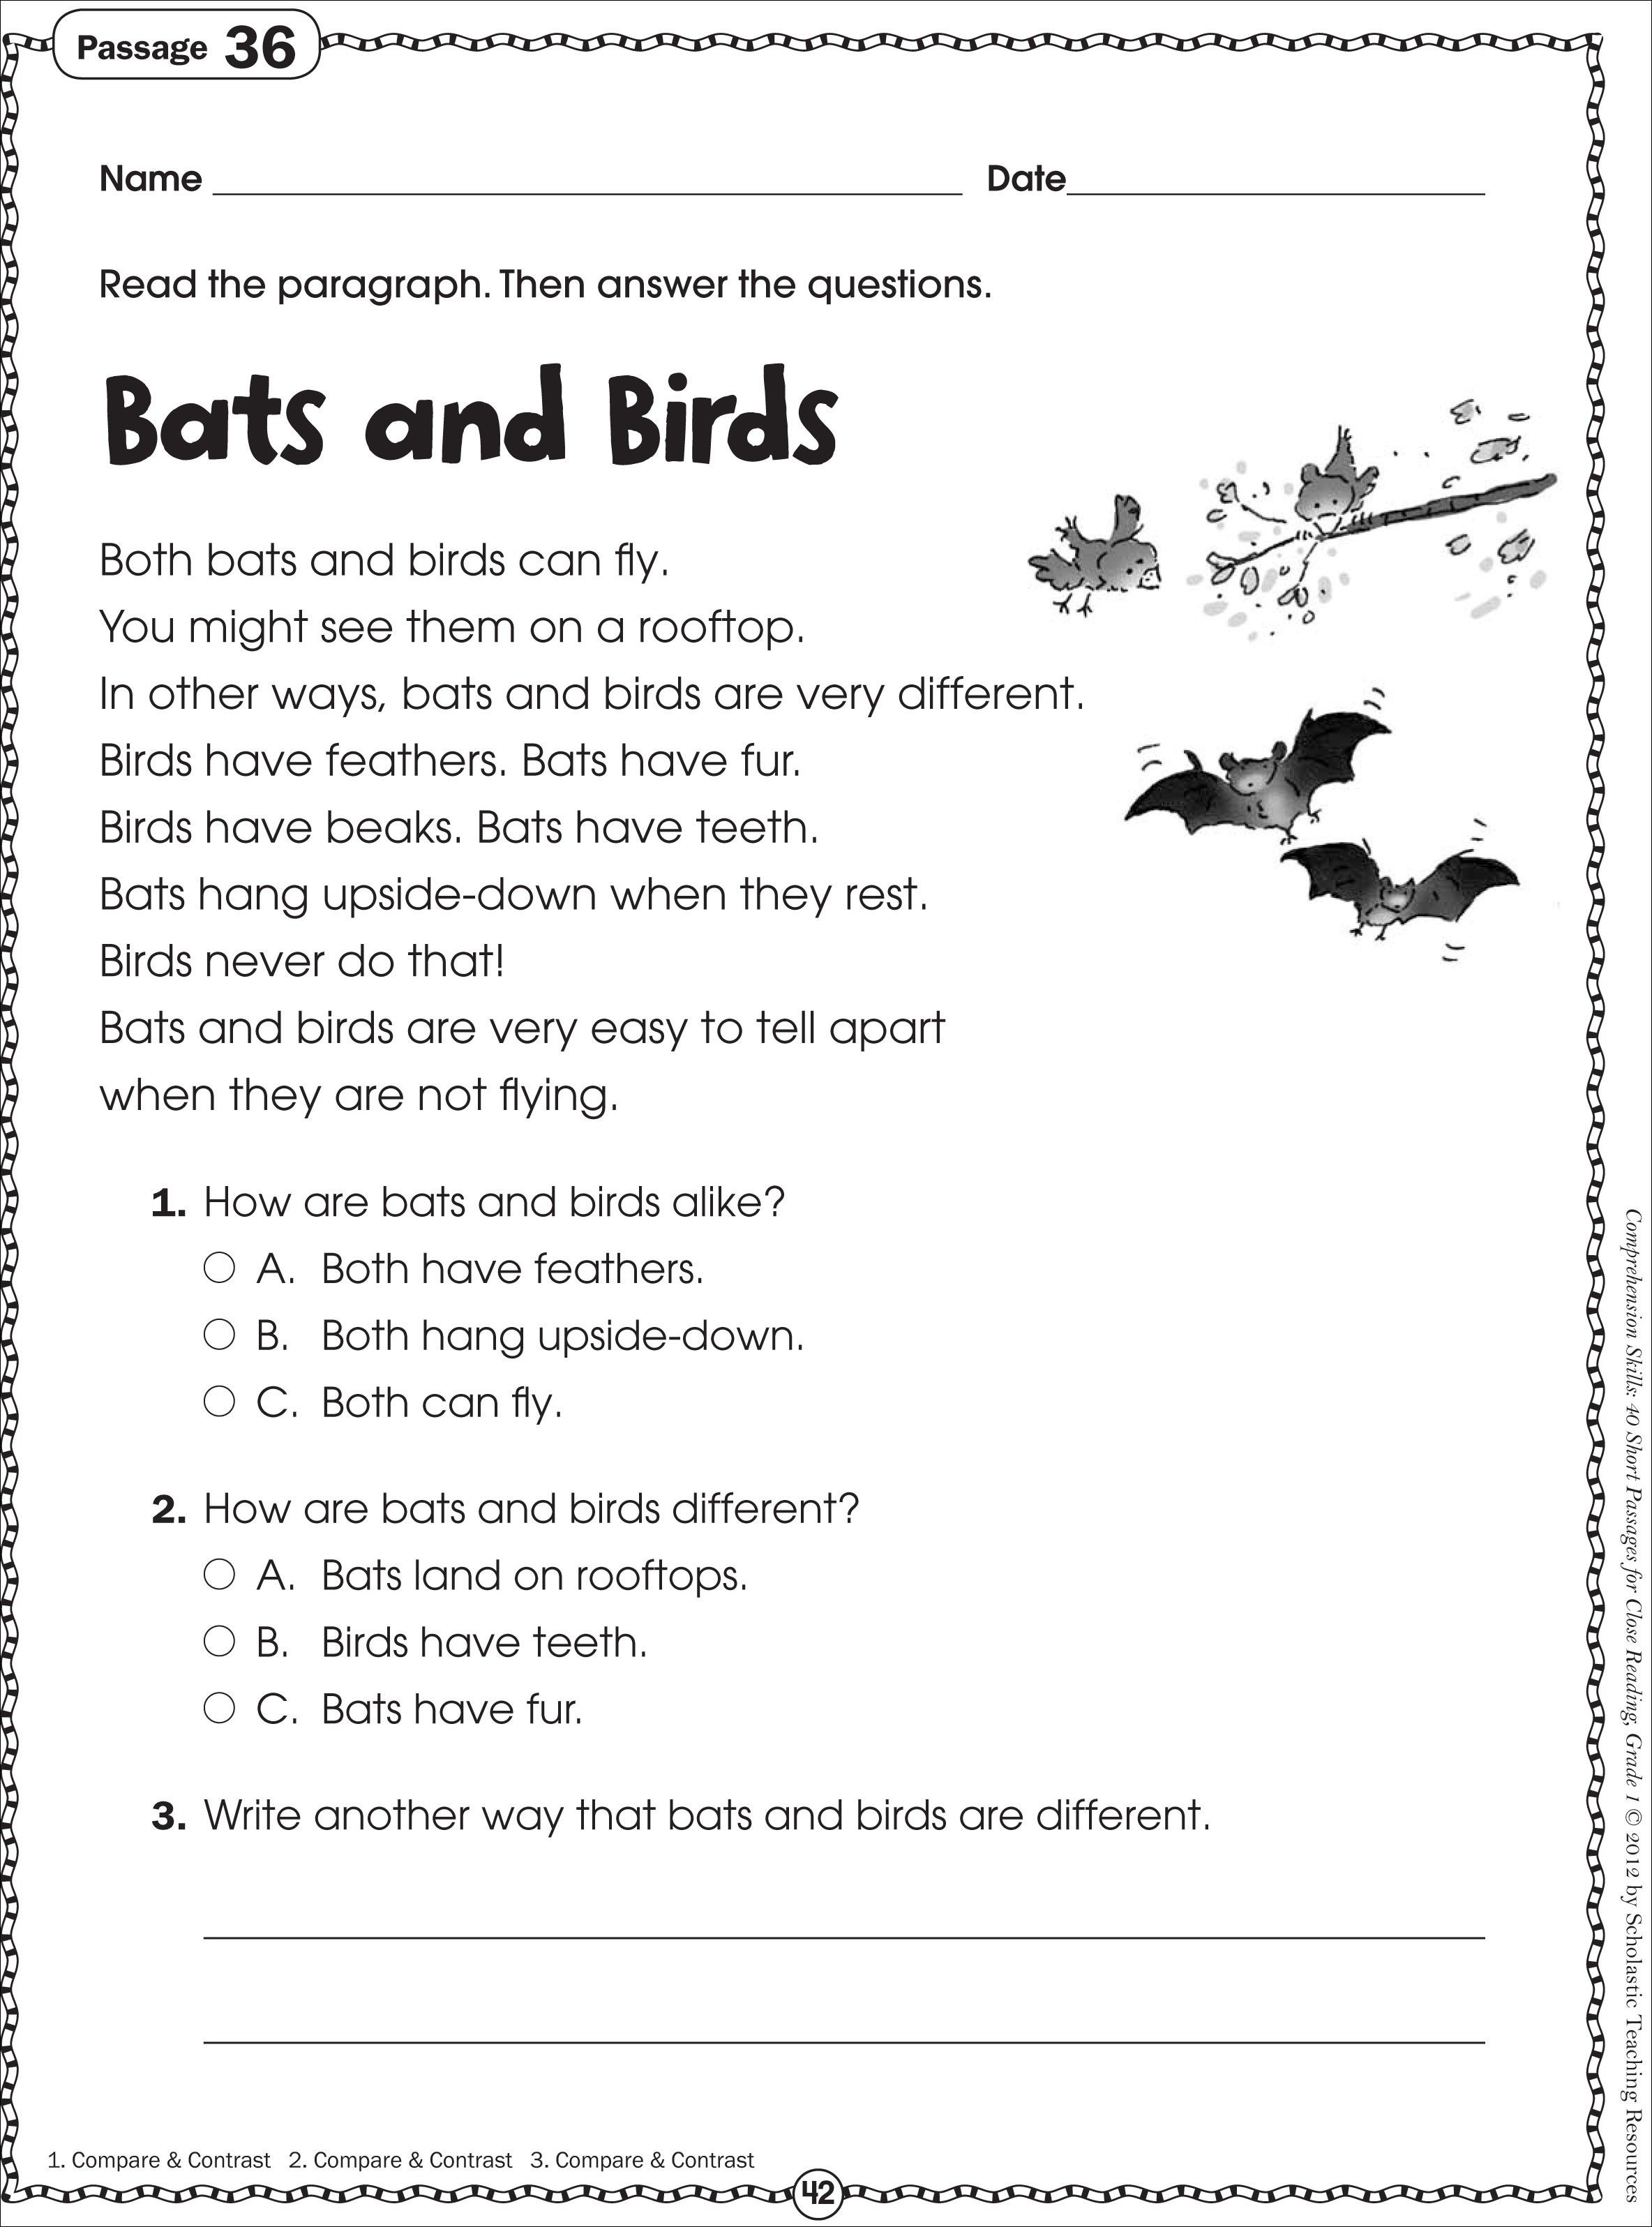 Free Printable Reading Comprehension Worksheets For Kindergarten - Free Printable Reading Games For 2Nd Graders